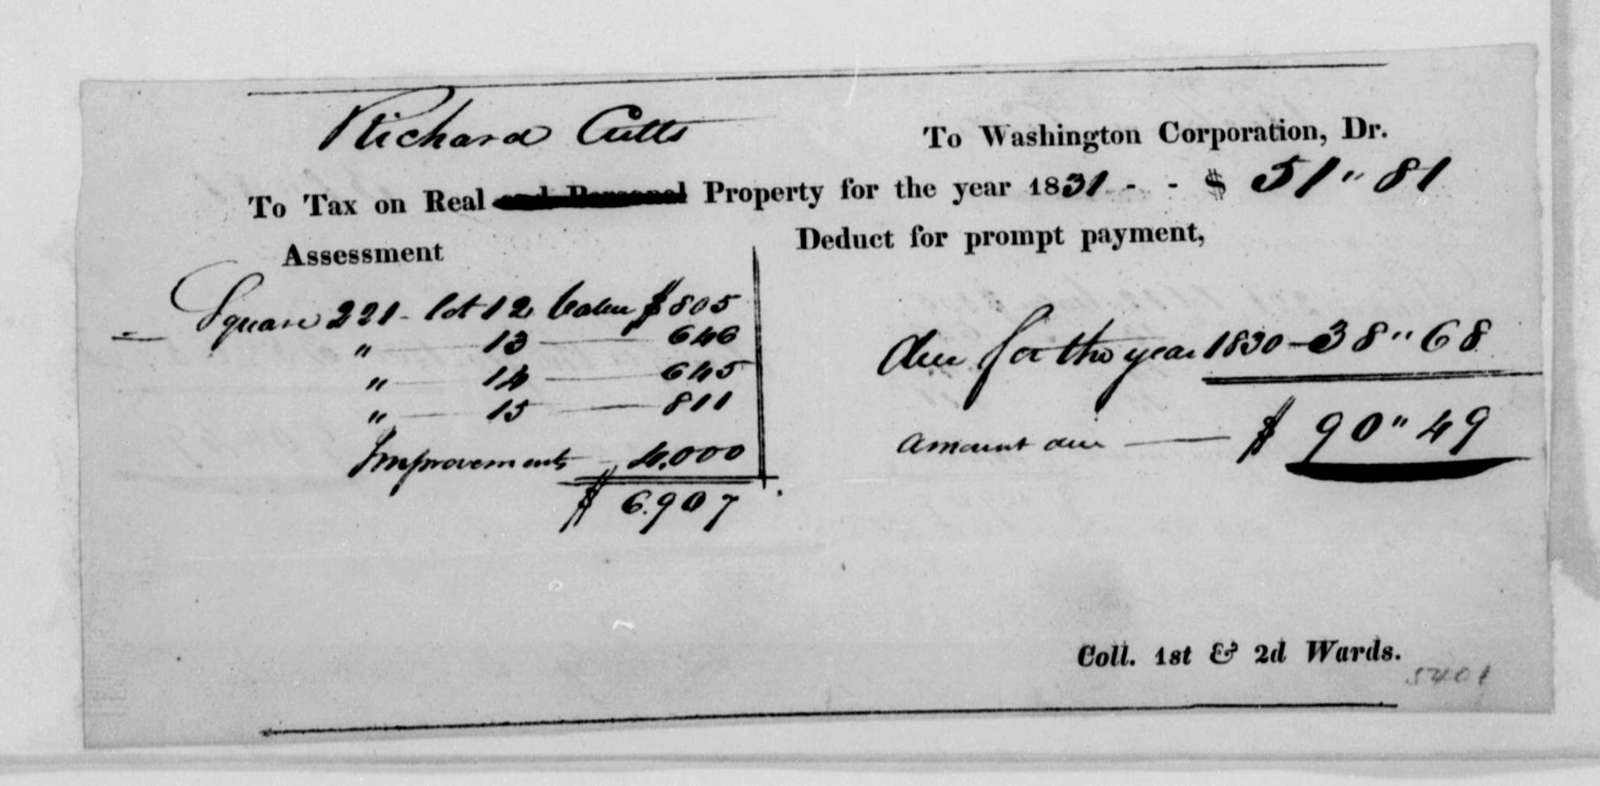 Richard Cutts to Abraham G. Lansing, April 17, 1813. With Tax Draft.